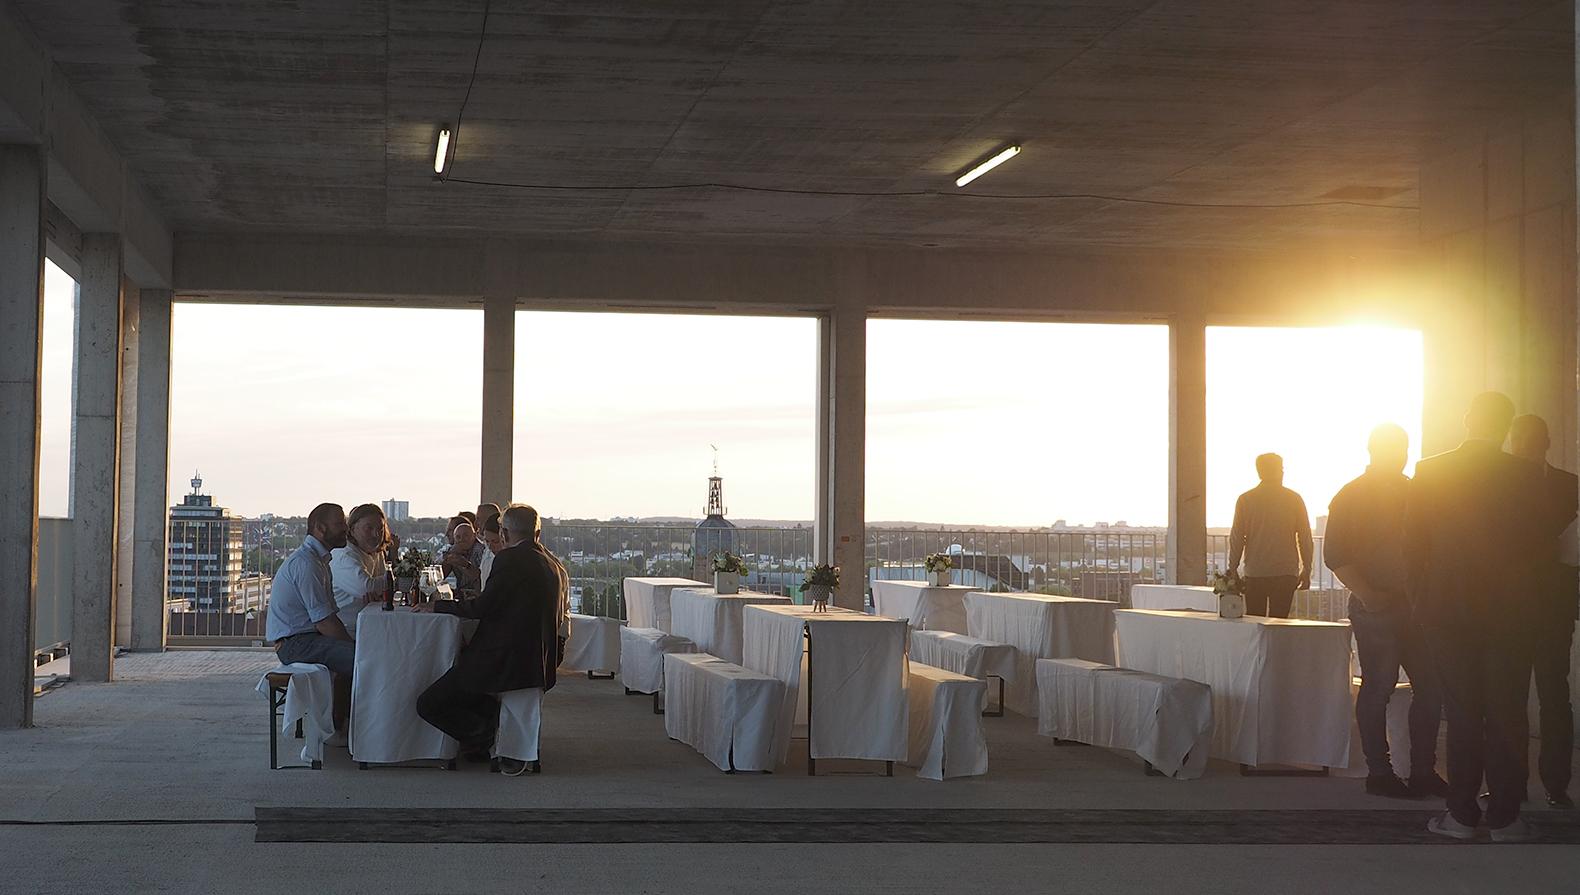 Sonnenuntergang im Festsaal